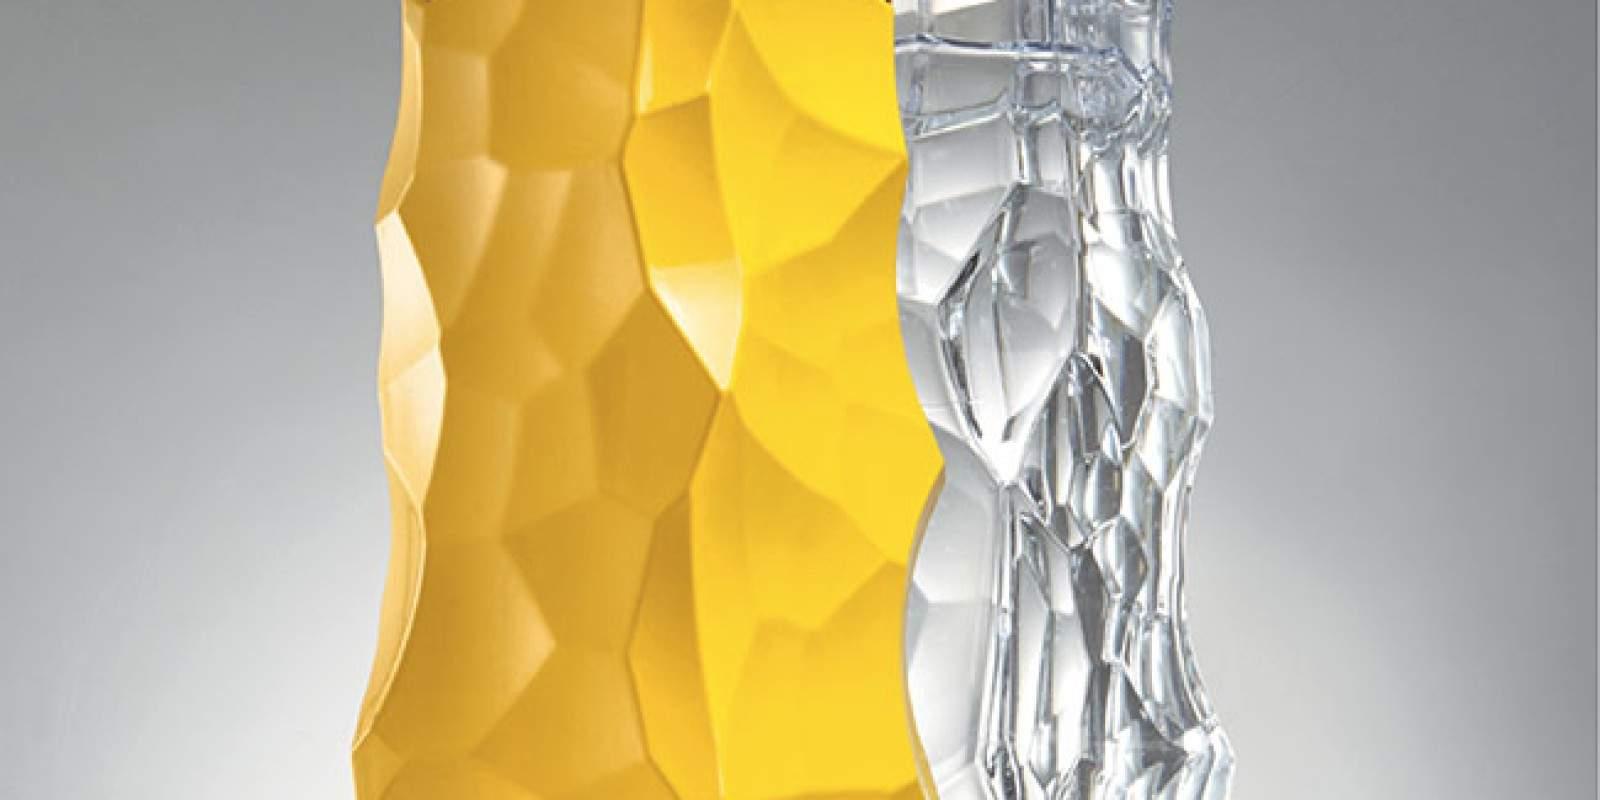 duo de carafes ricard par les architectes jakob macfarlane jo yana. Black Bedroom Furniture Sets. Home Design Ideas